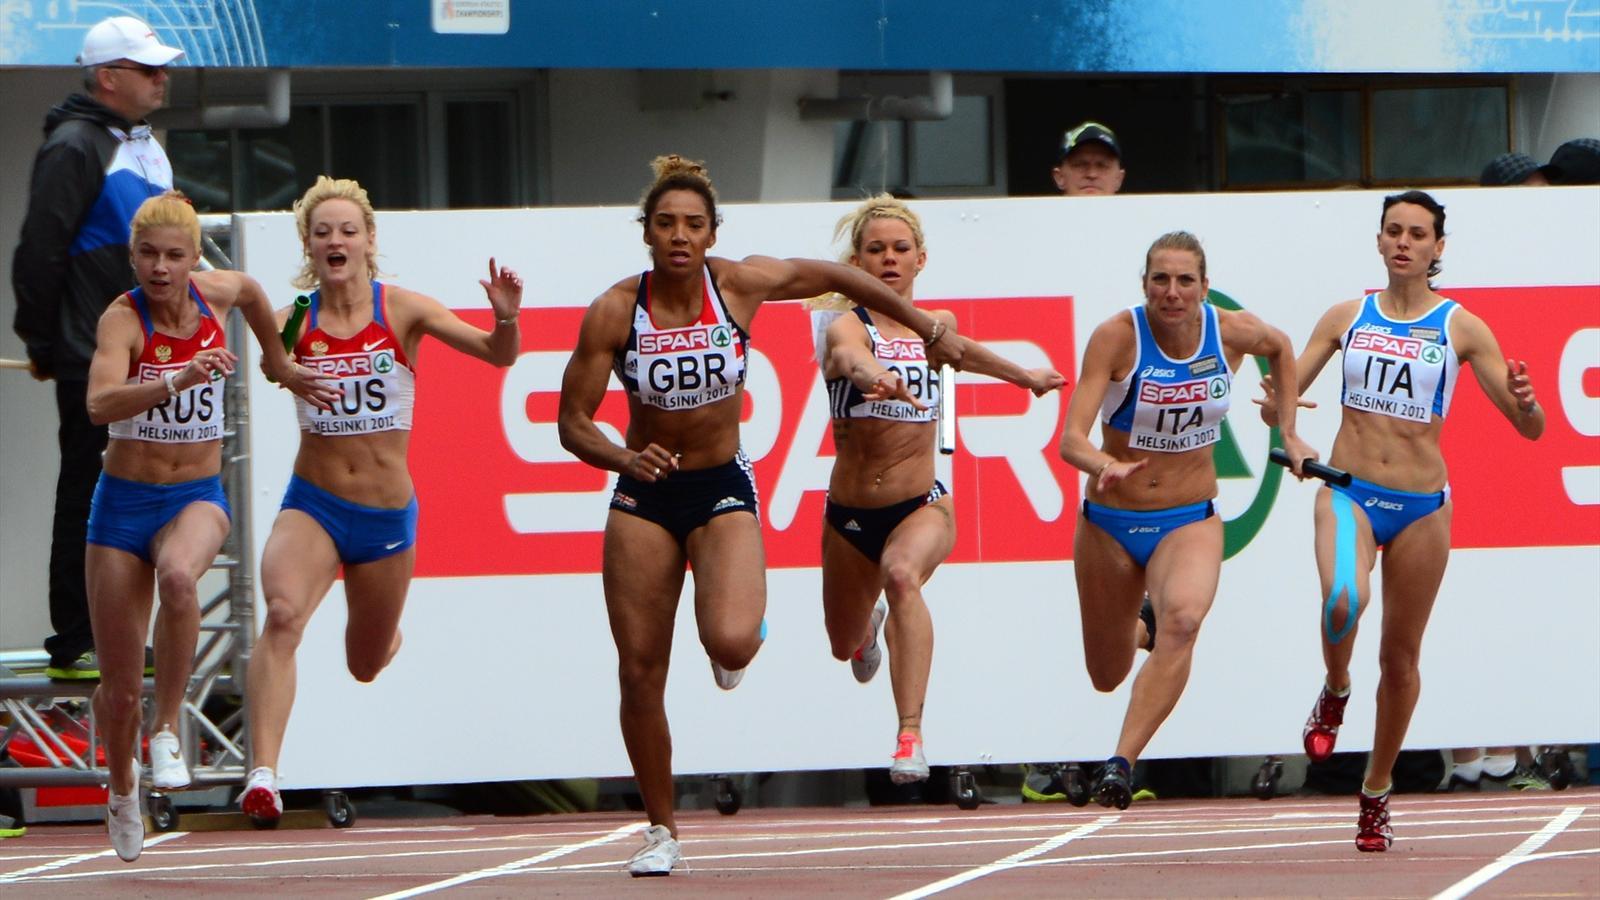 GB relay women not at 2012 - Athletics - Eurosport